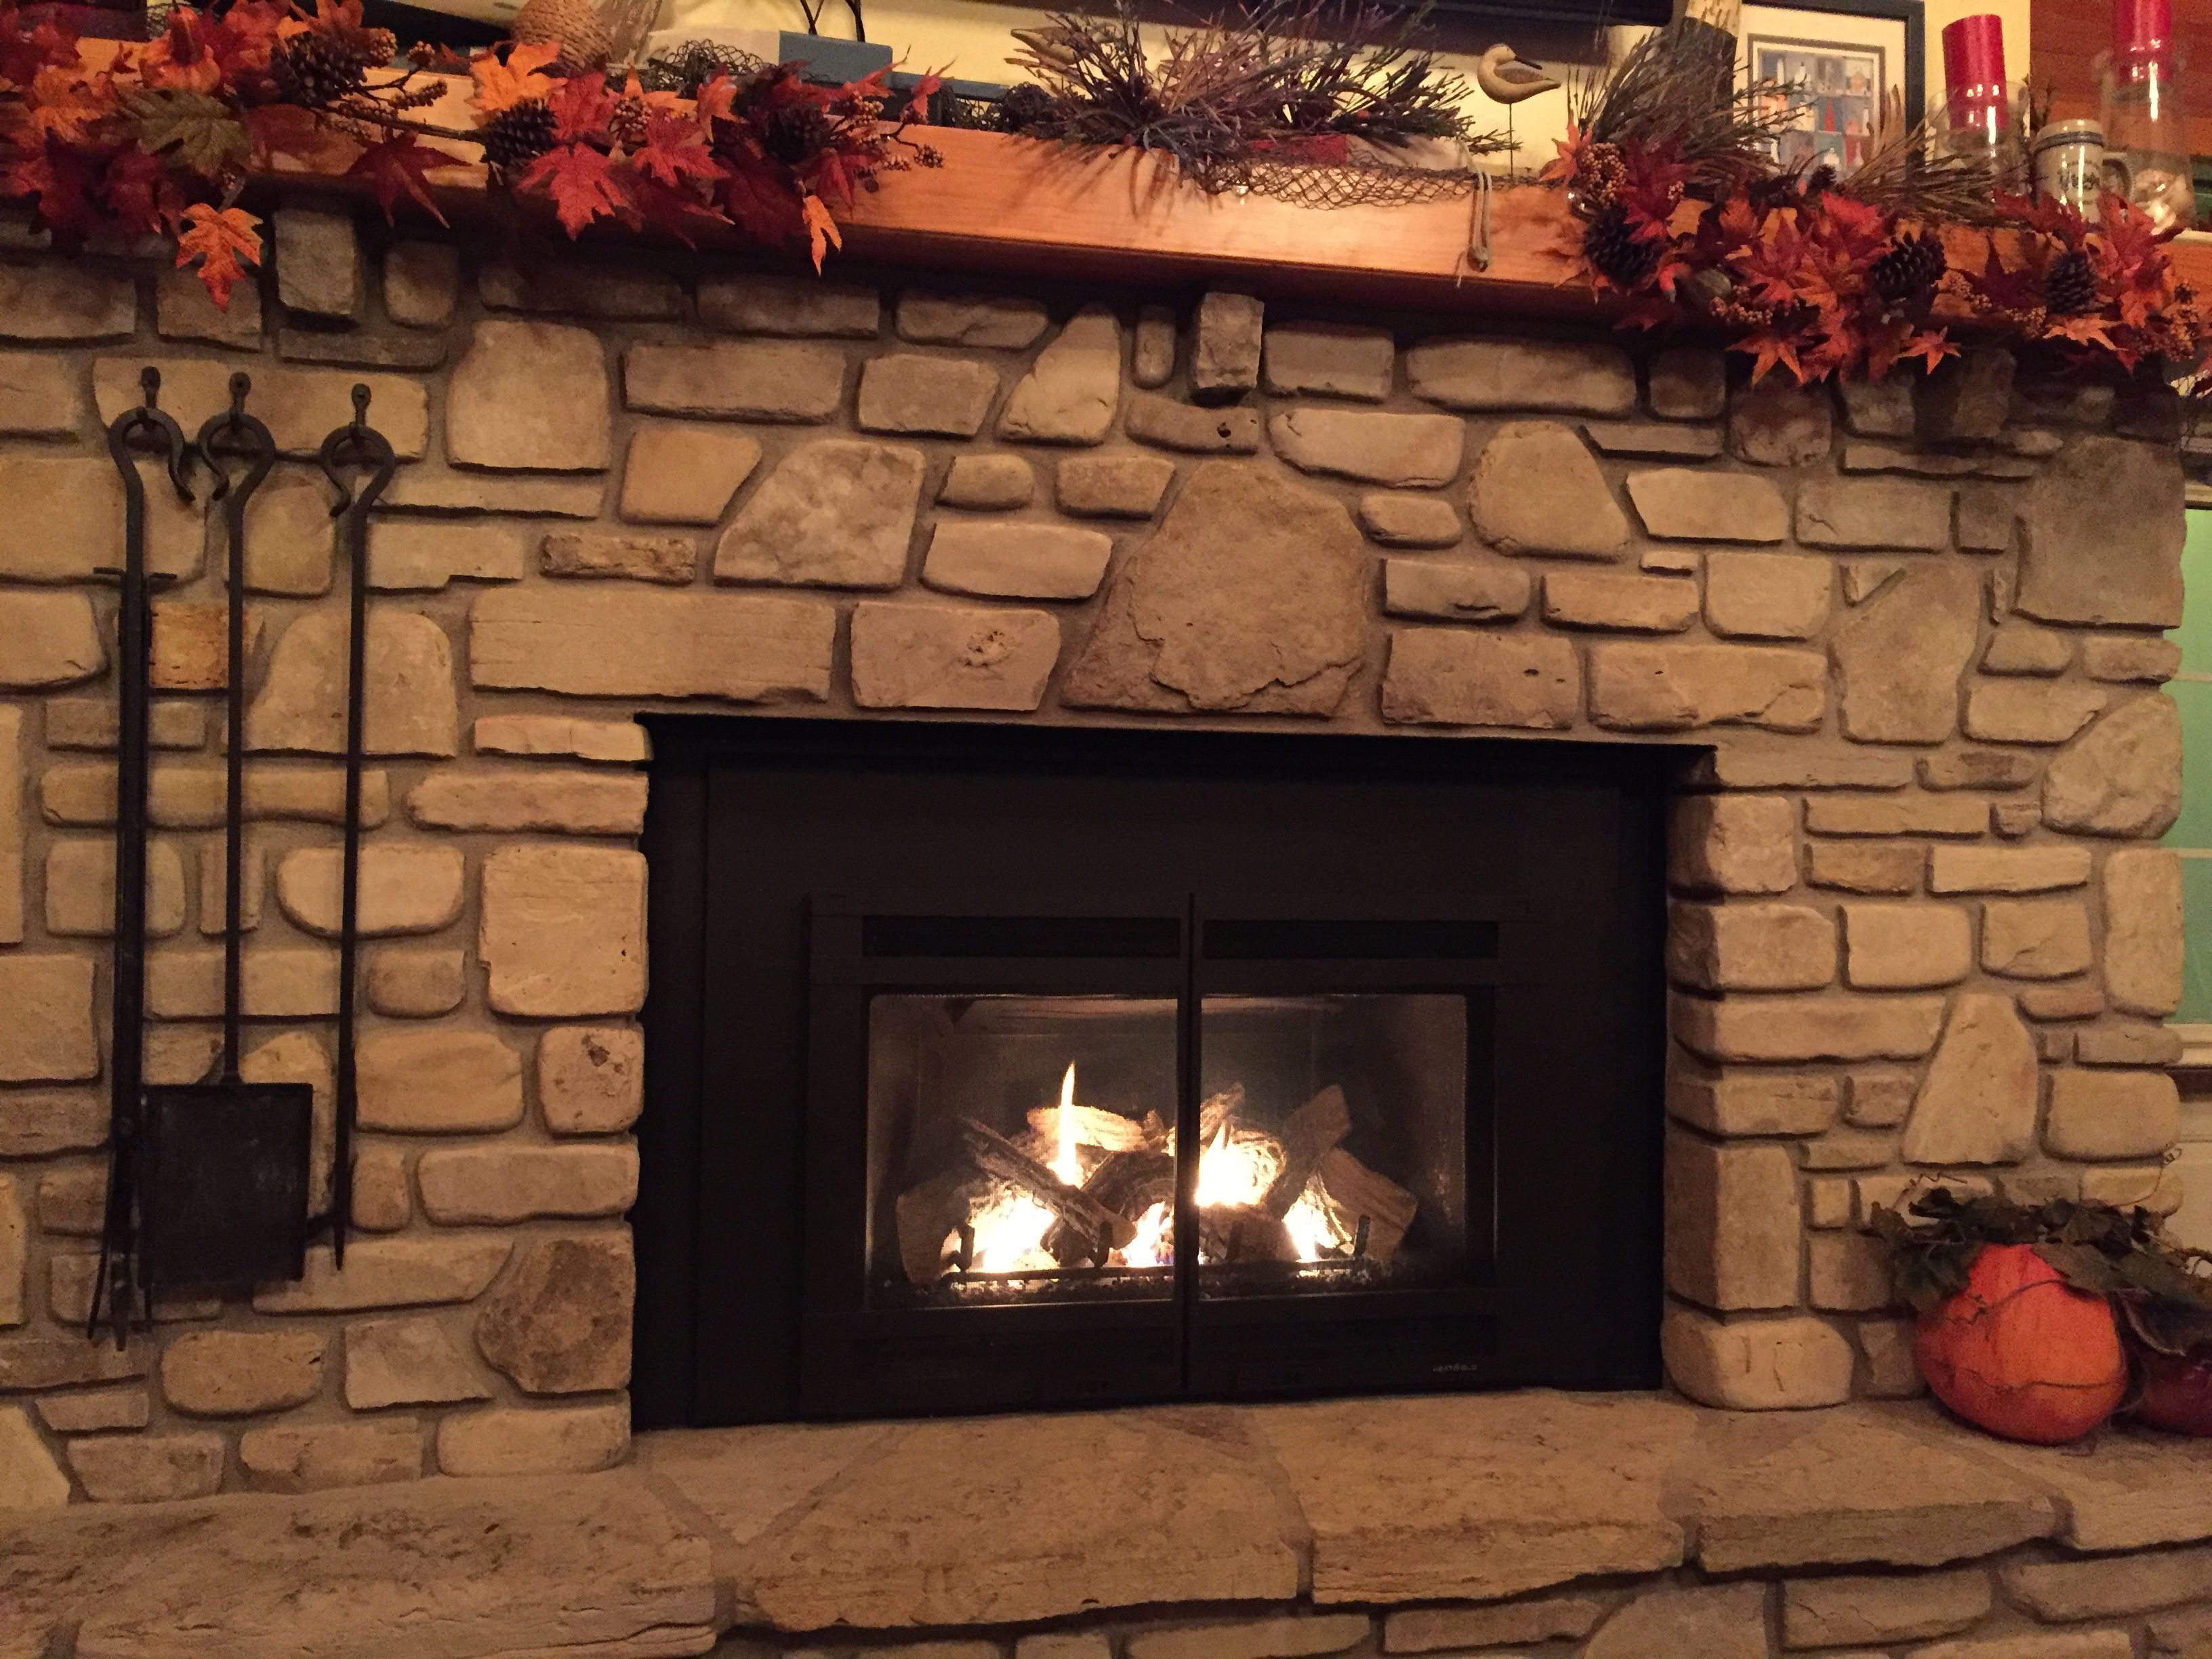 Pin by Margaret K on Fireplace mantel Fireplace mantels